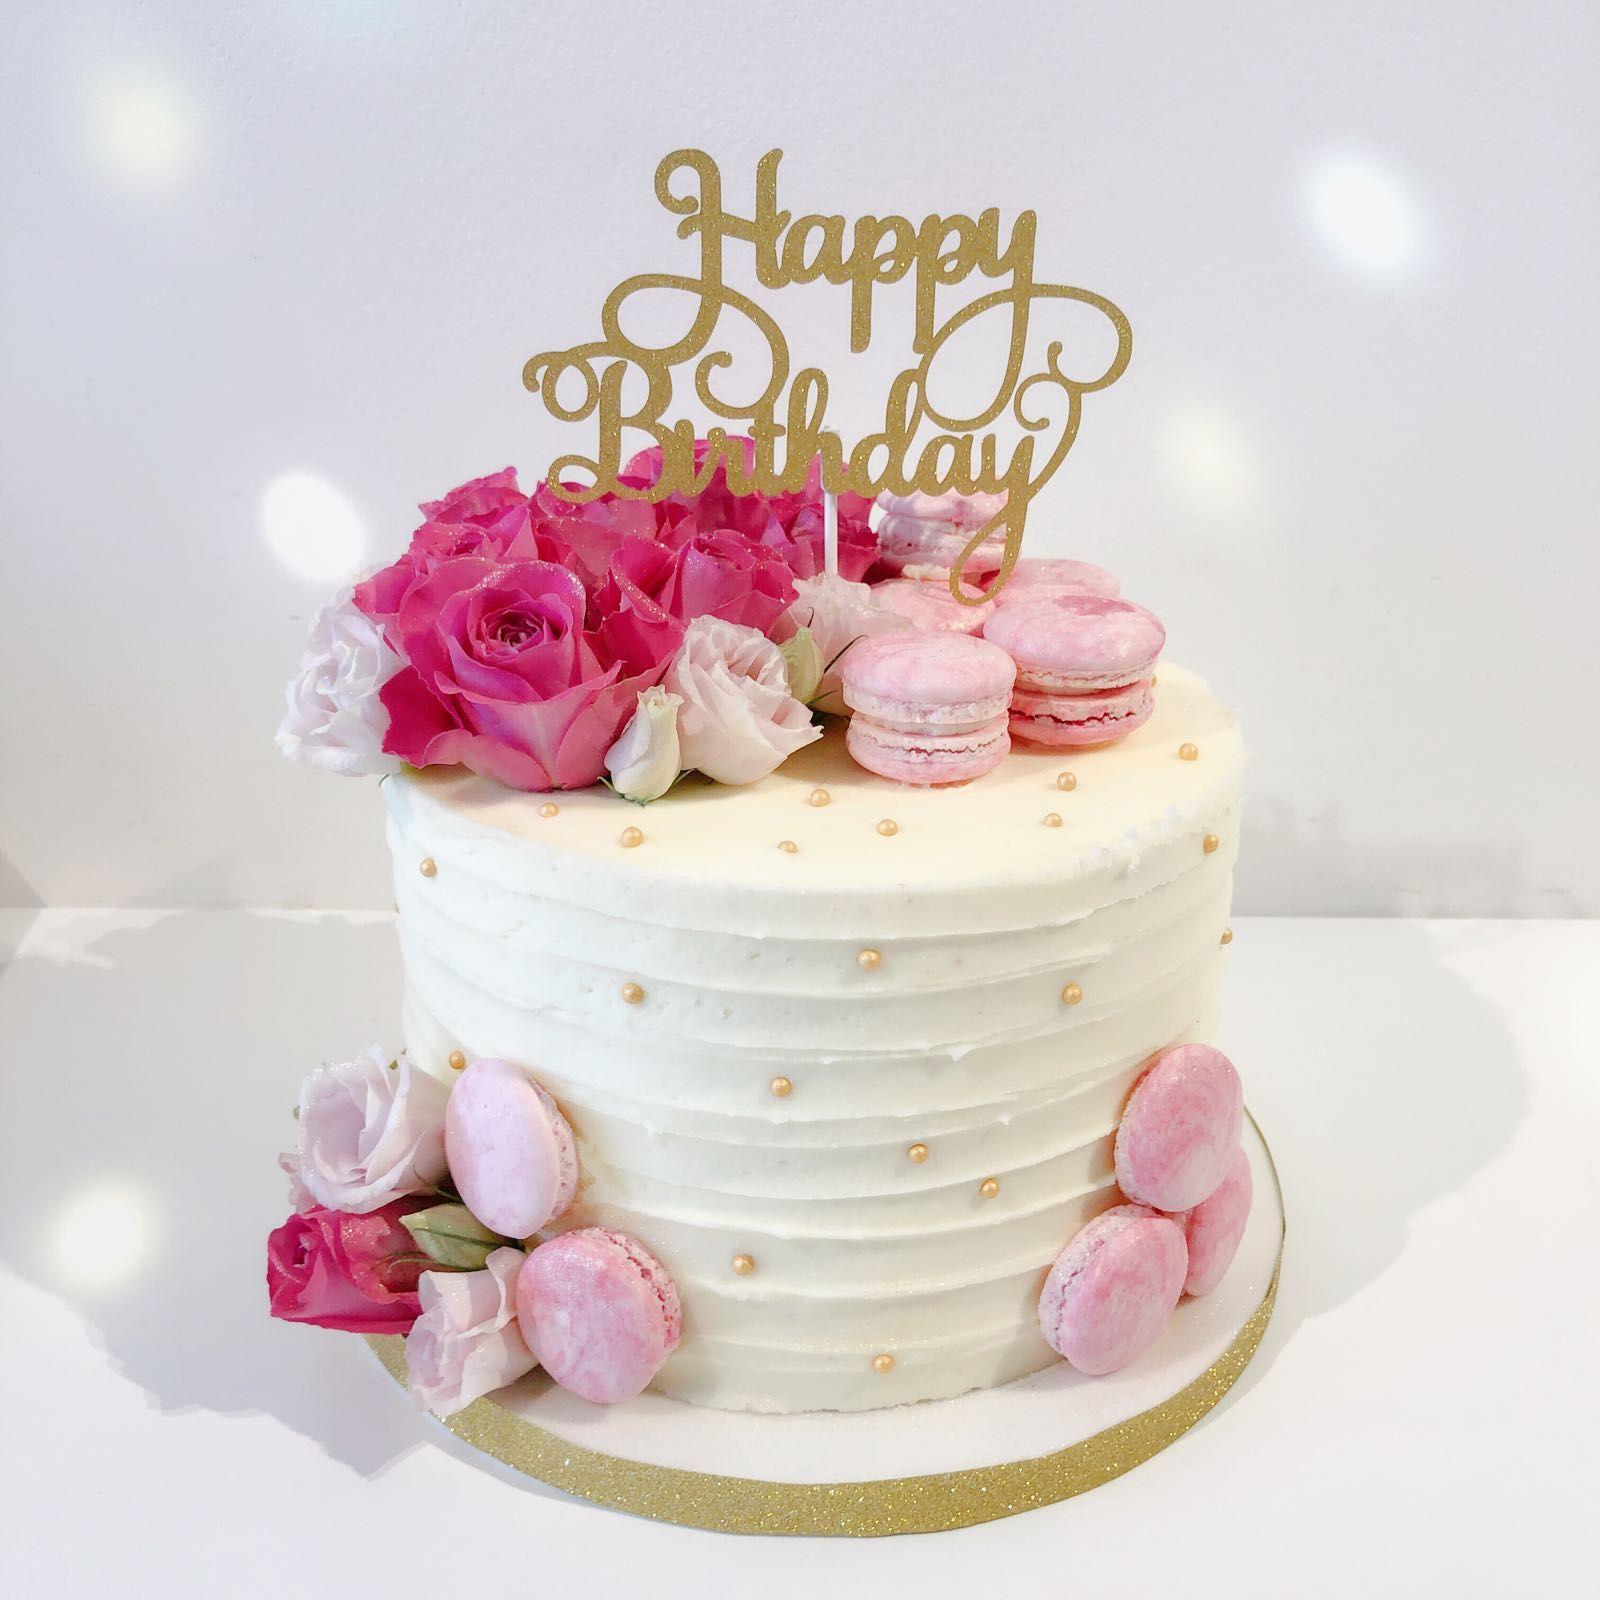 Happy birthday Jon Creative birthday cakes, Birthday